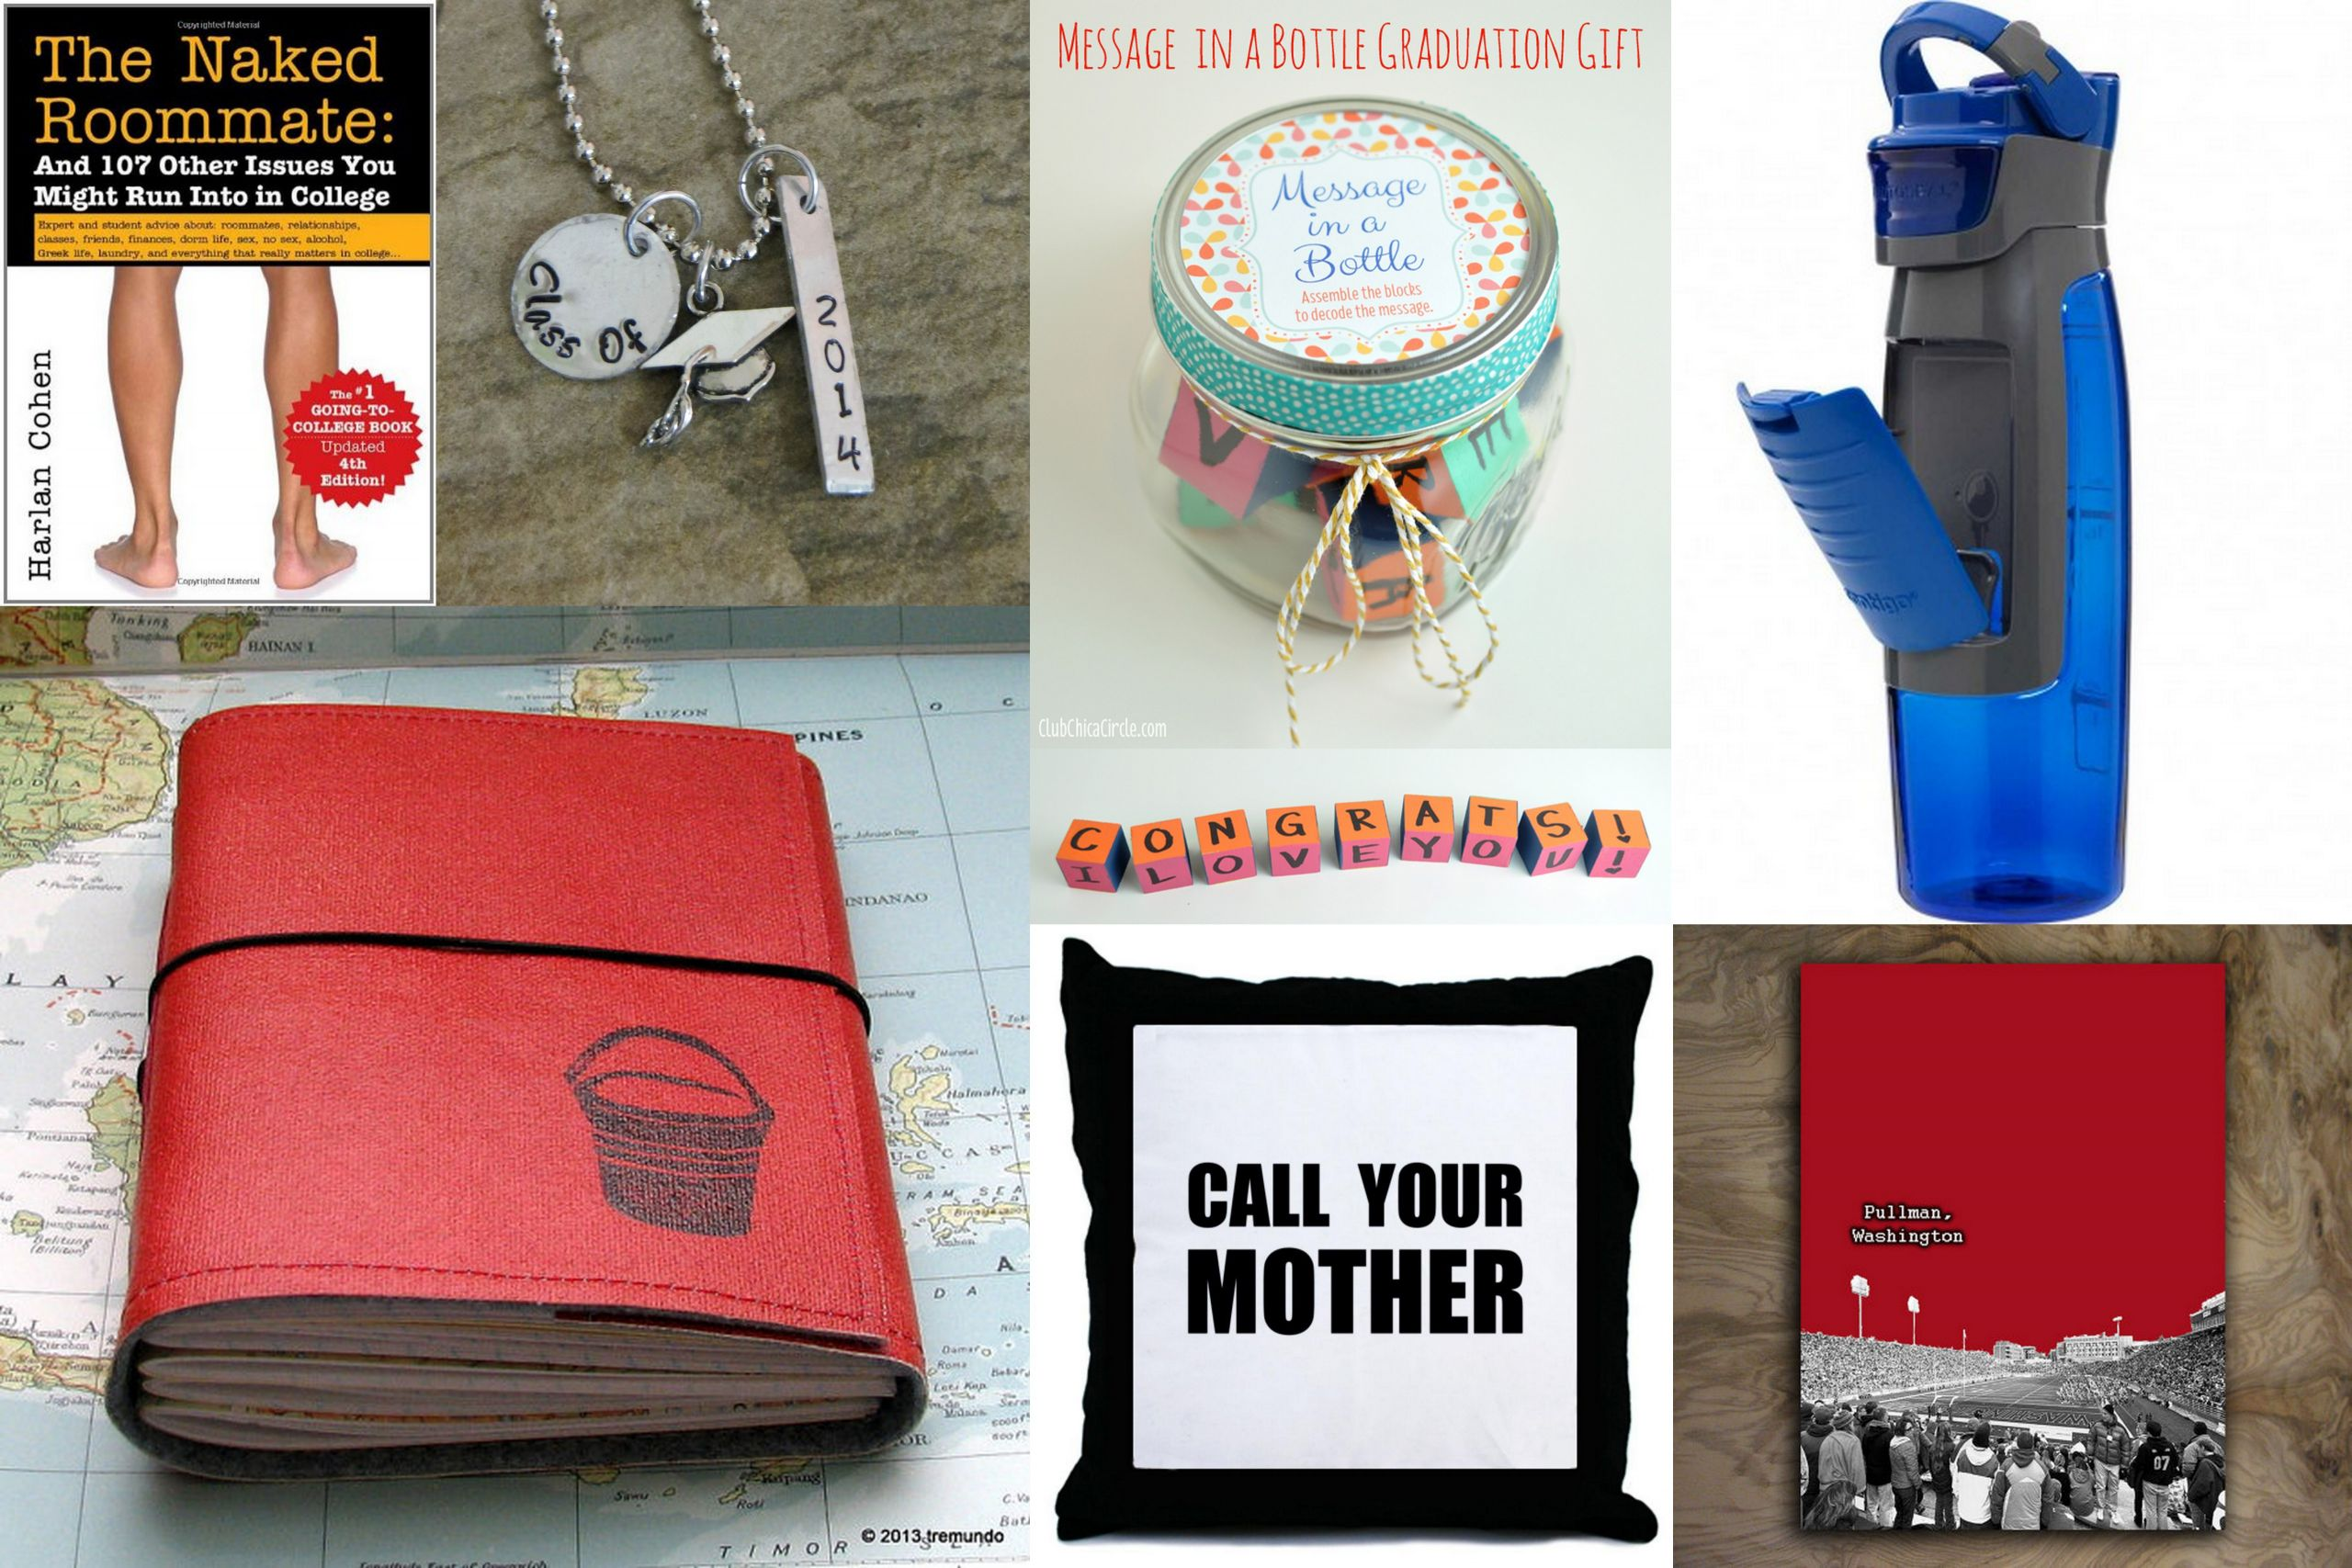 Elementary School Graduation Gift Ideas  10 Unique Graduation Gifts for 2014